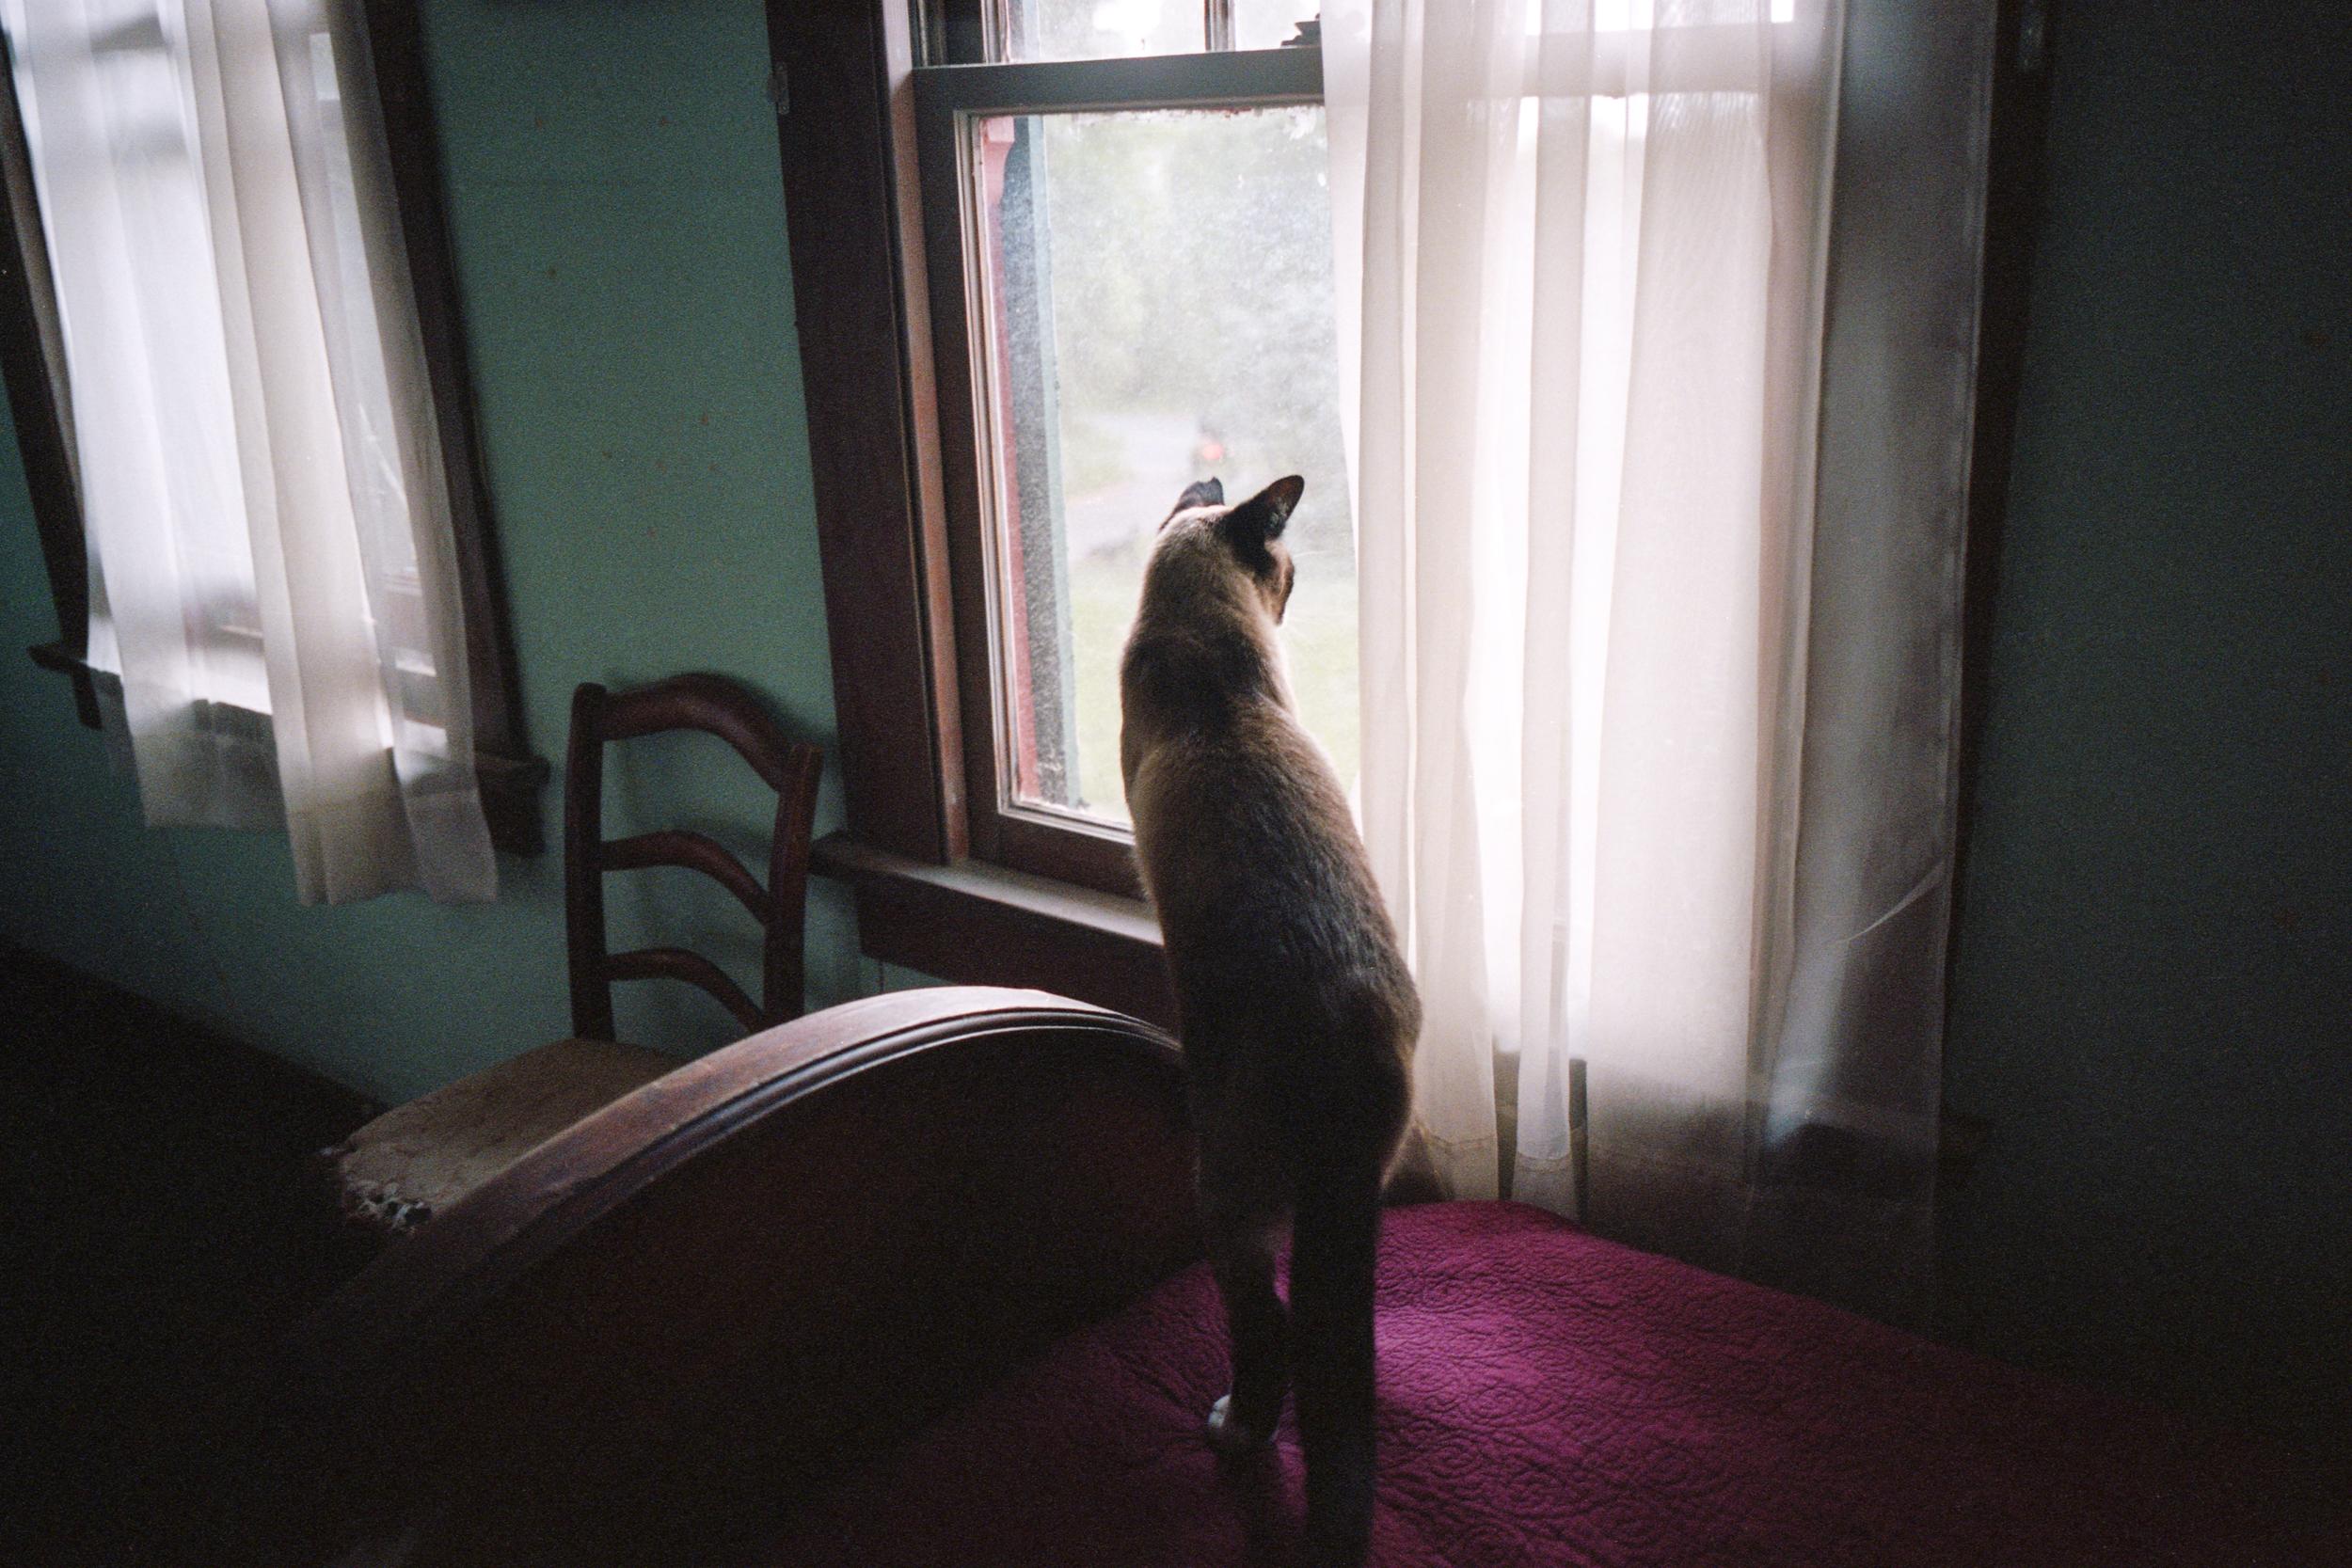 Ingel Haven 7 Cat in the Window.jpg